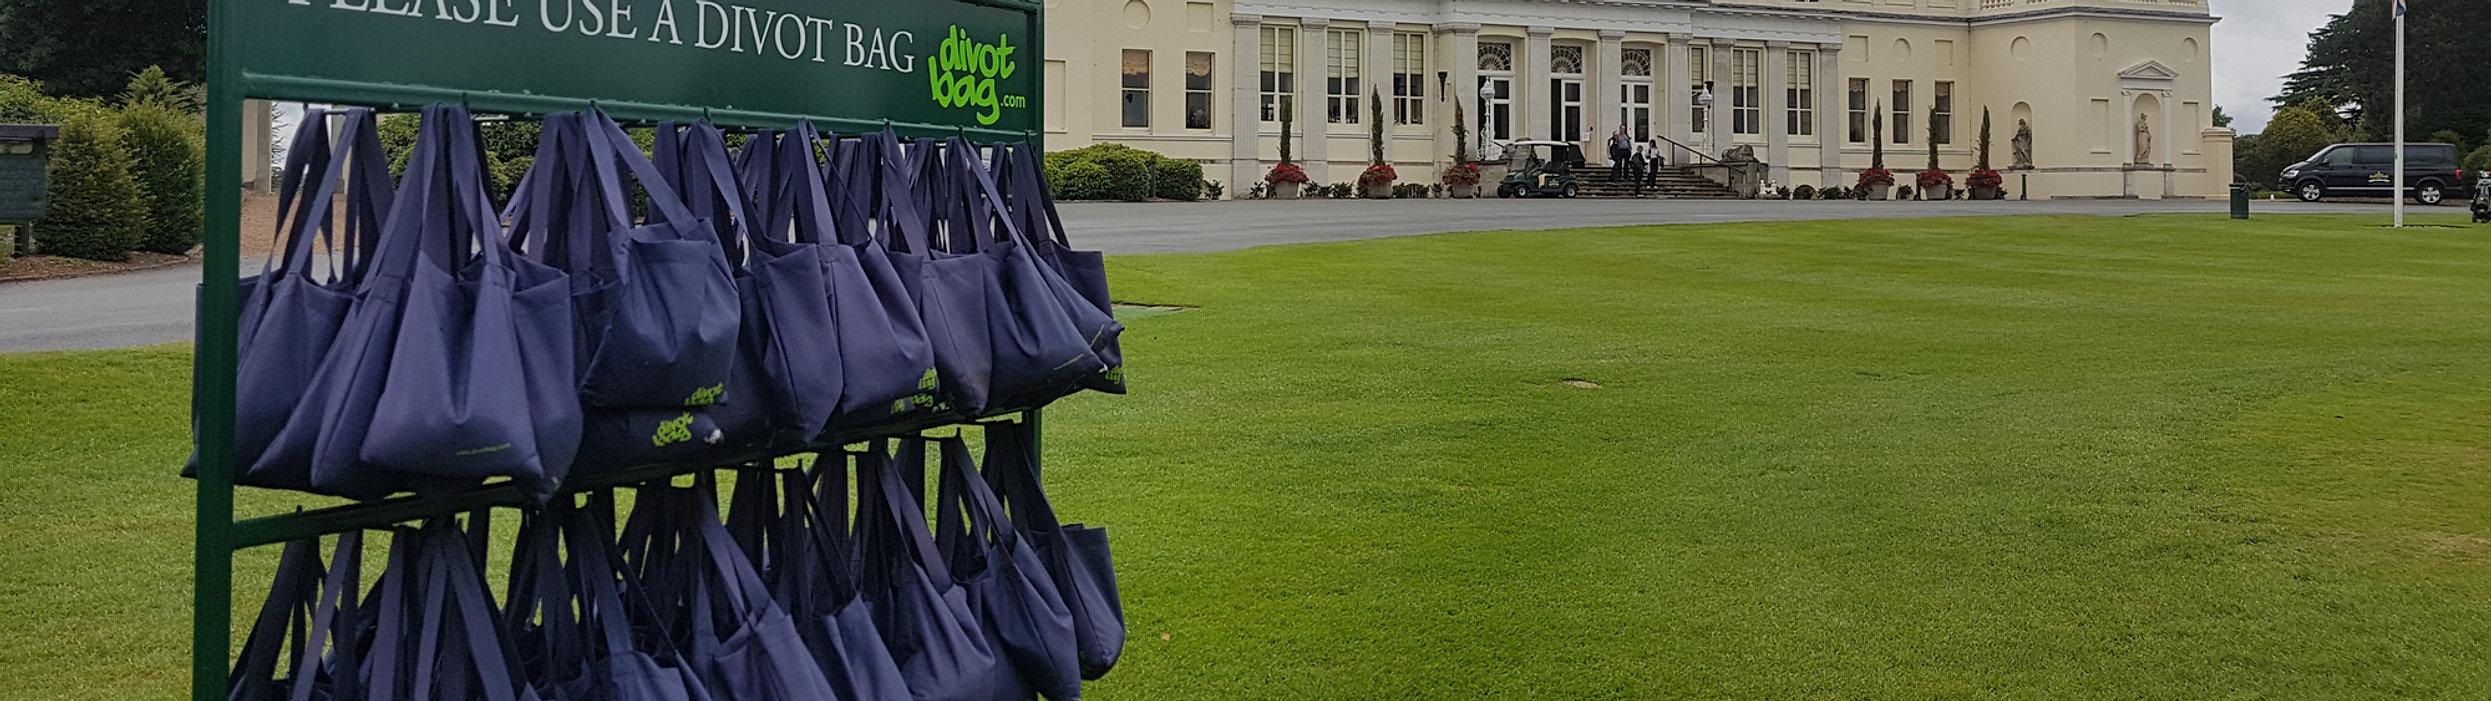 Divot Bags